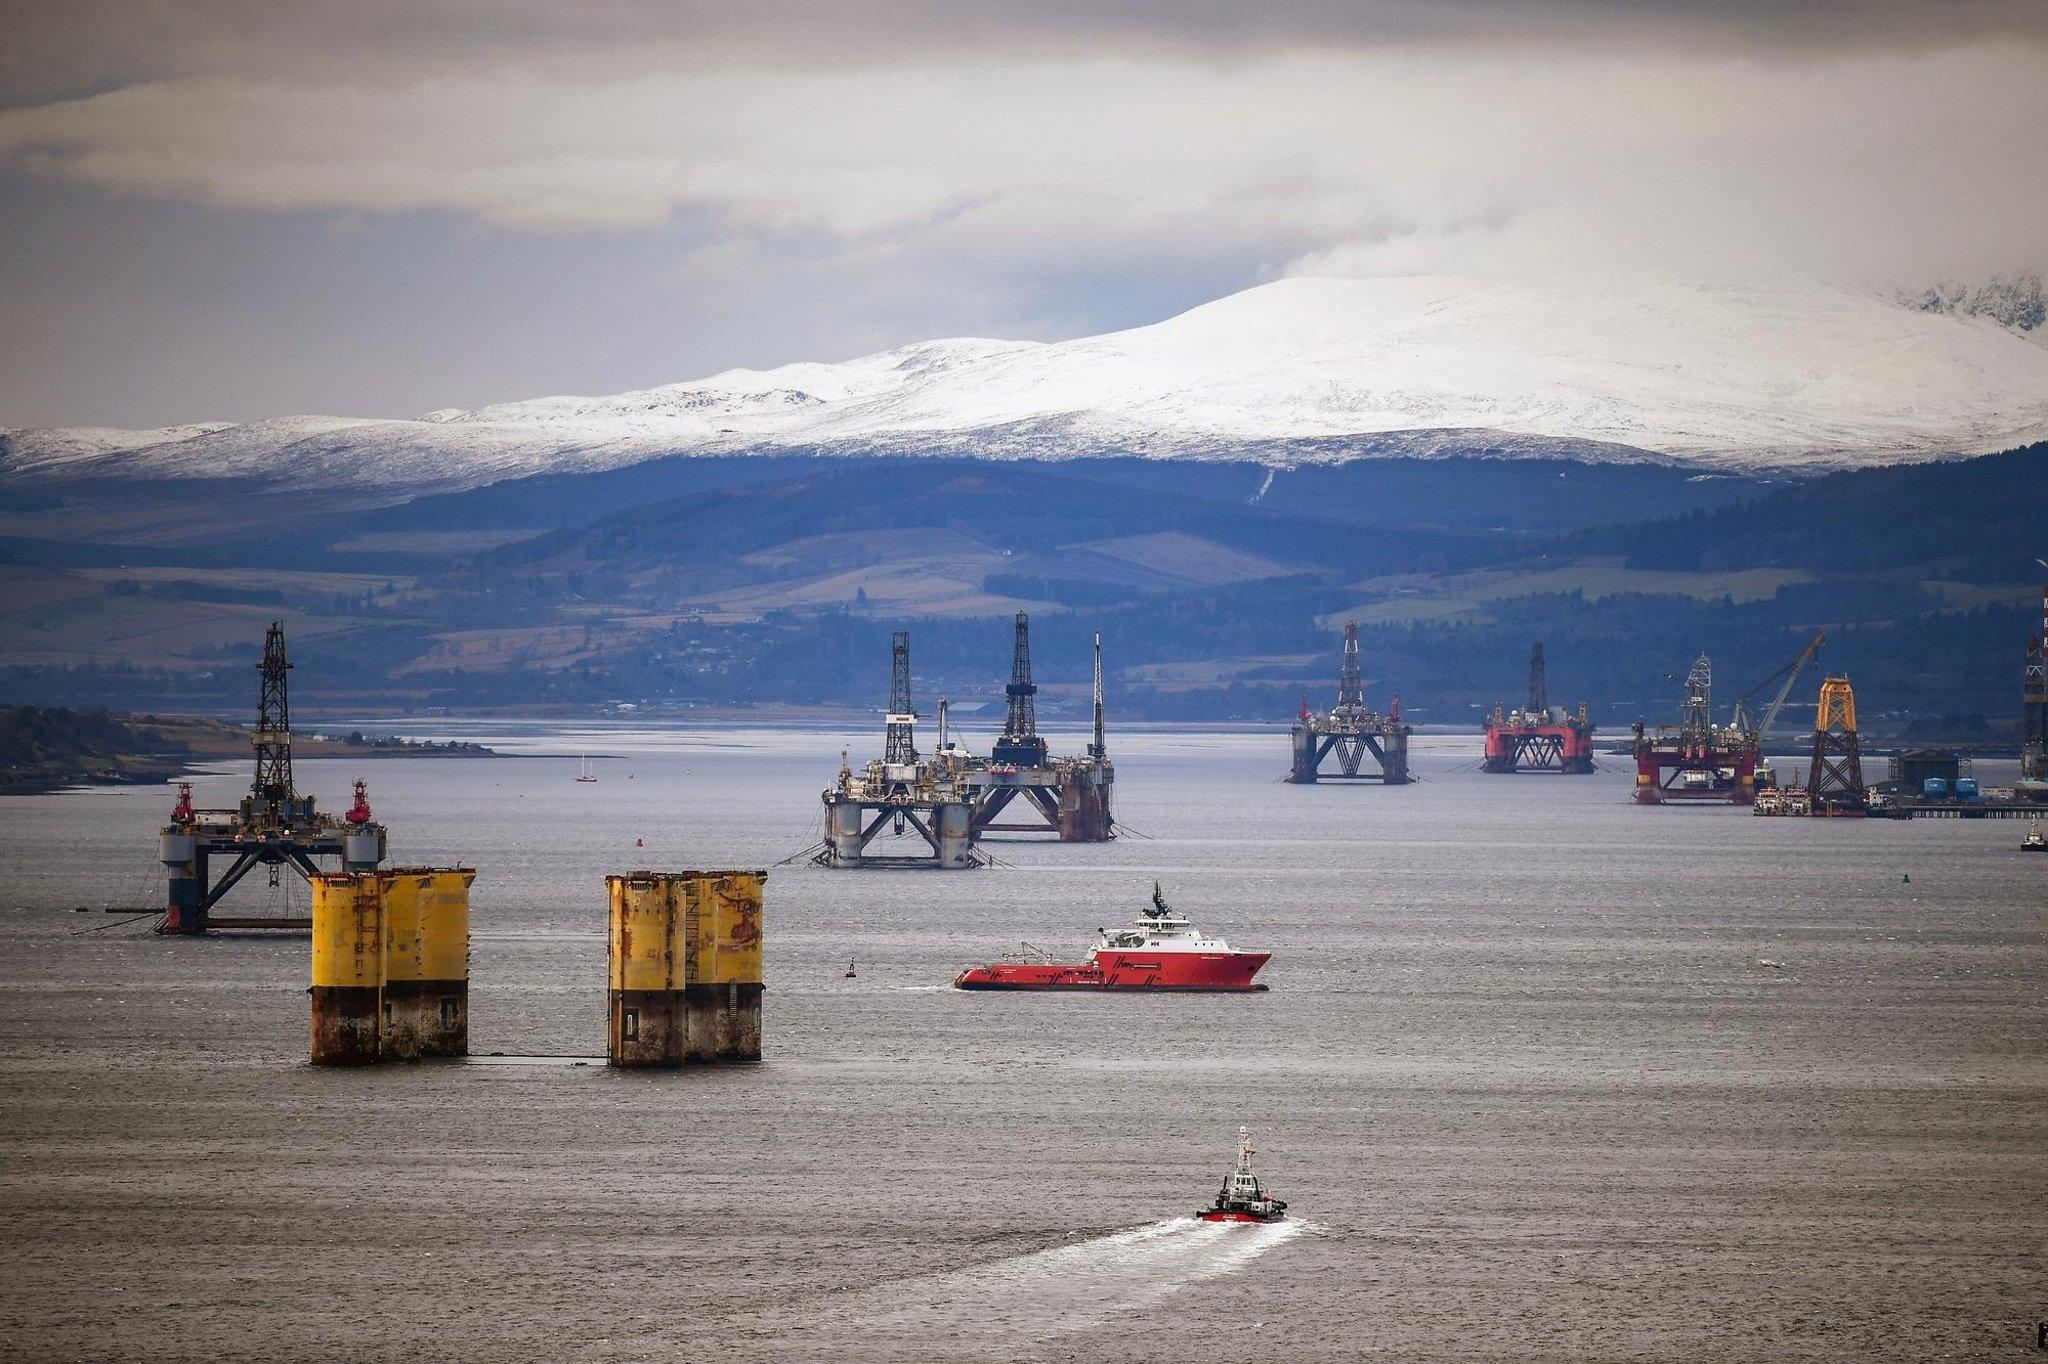 Festival orang benar COP26 seharusnya tidak mengarah pada akhir minyak dan gas Laut Utara – John McLellan